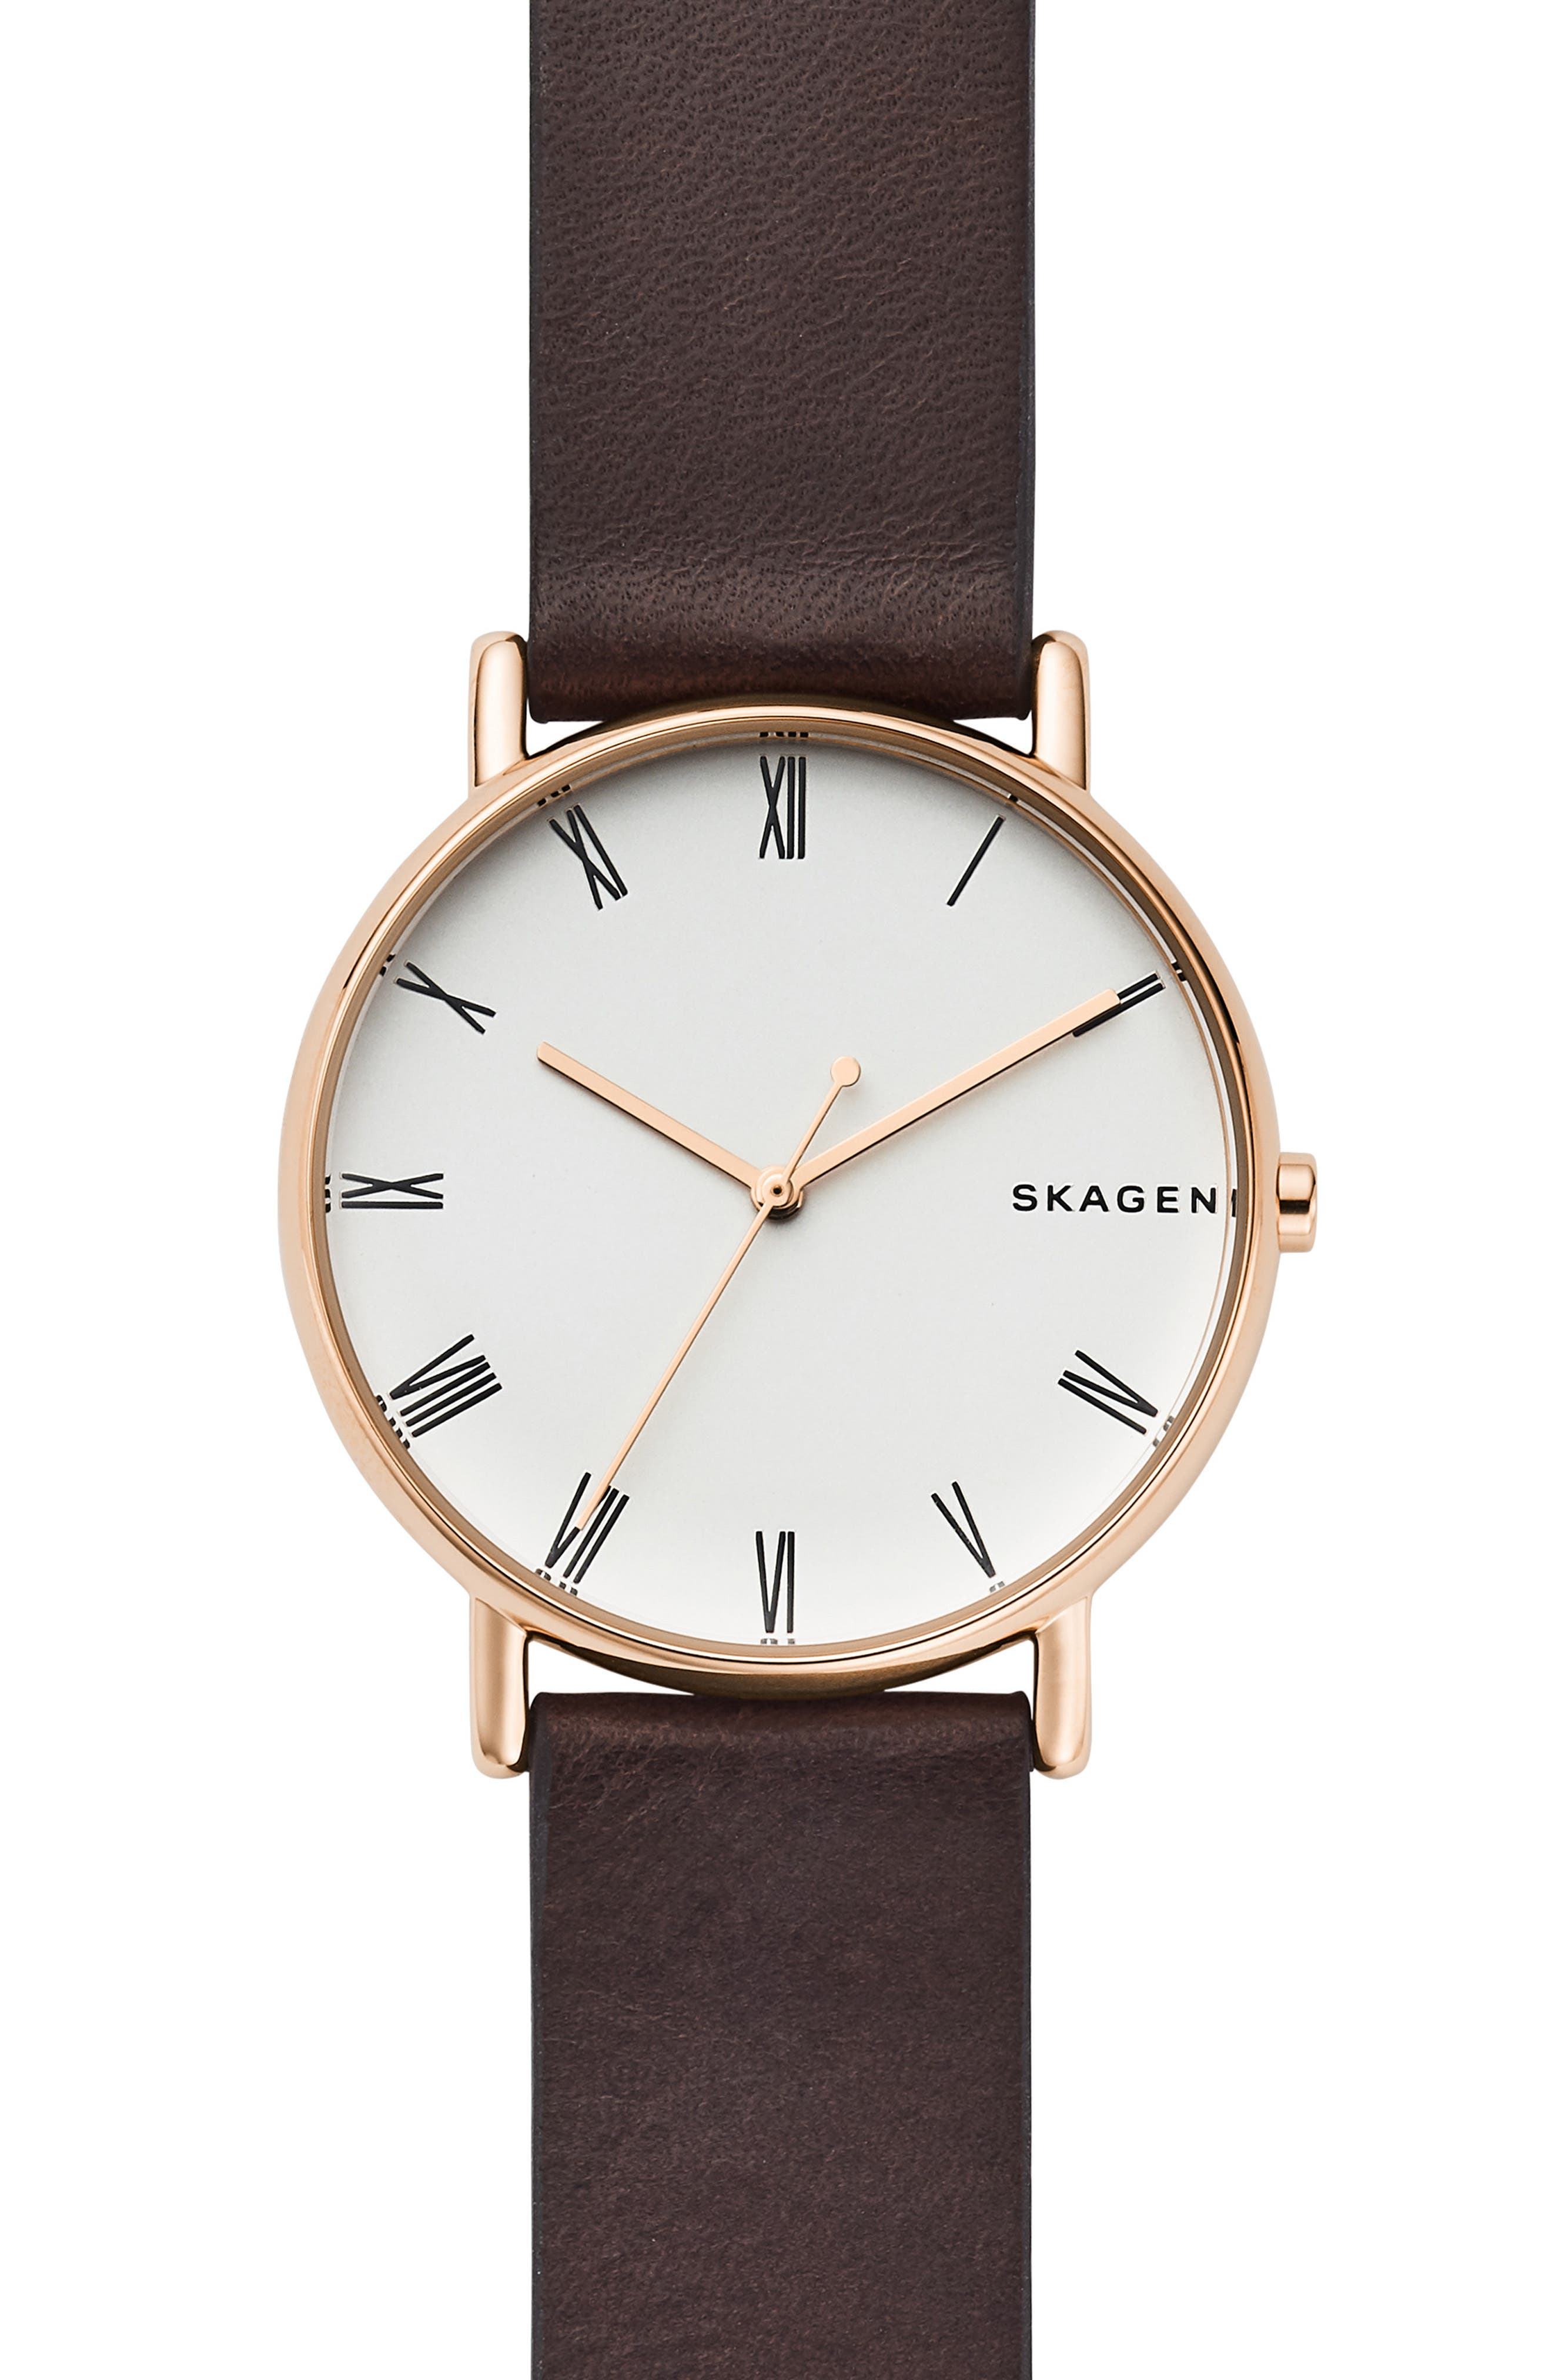 SKAGEN Signatur Leather Strap Watch, 40mm, Main, color, 200